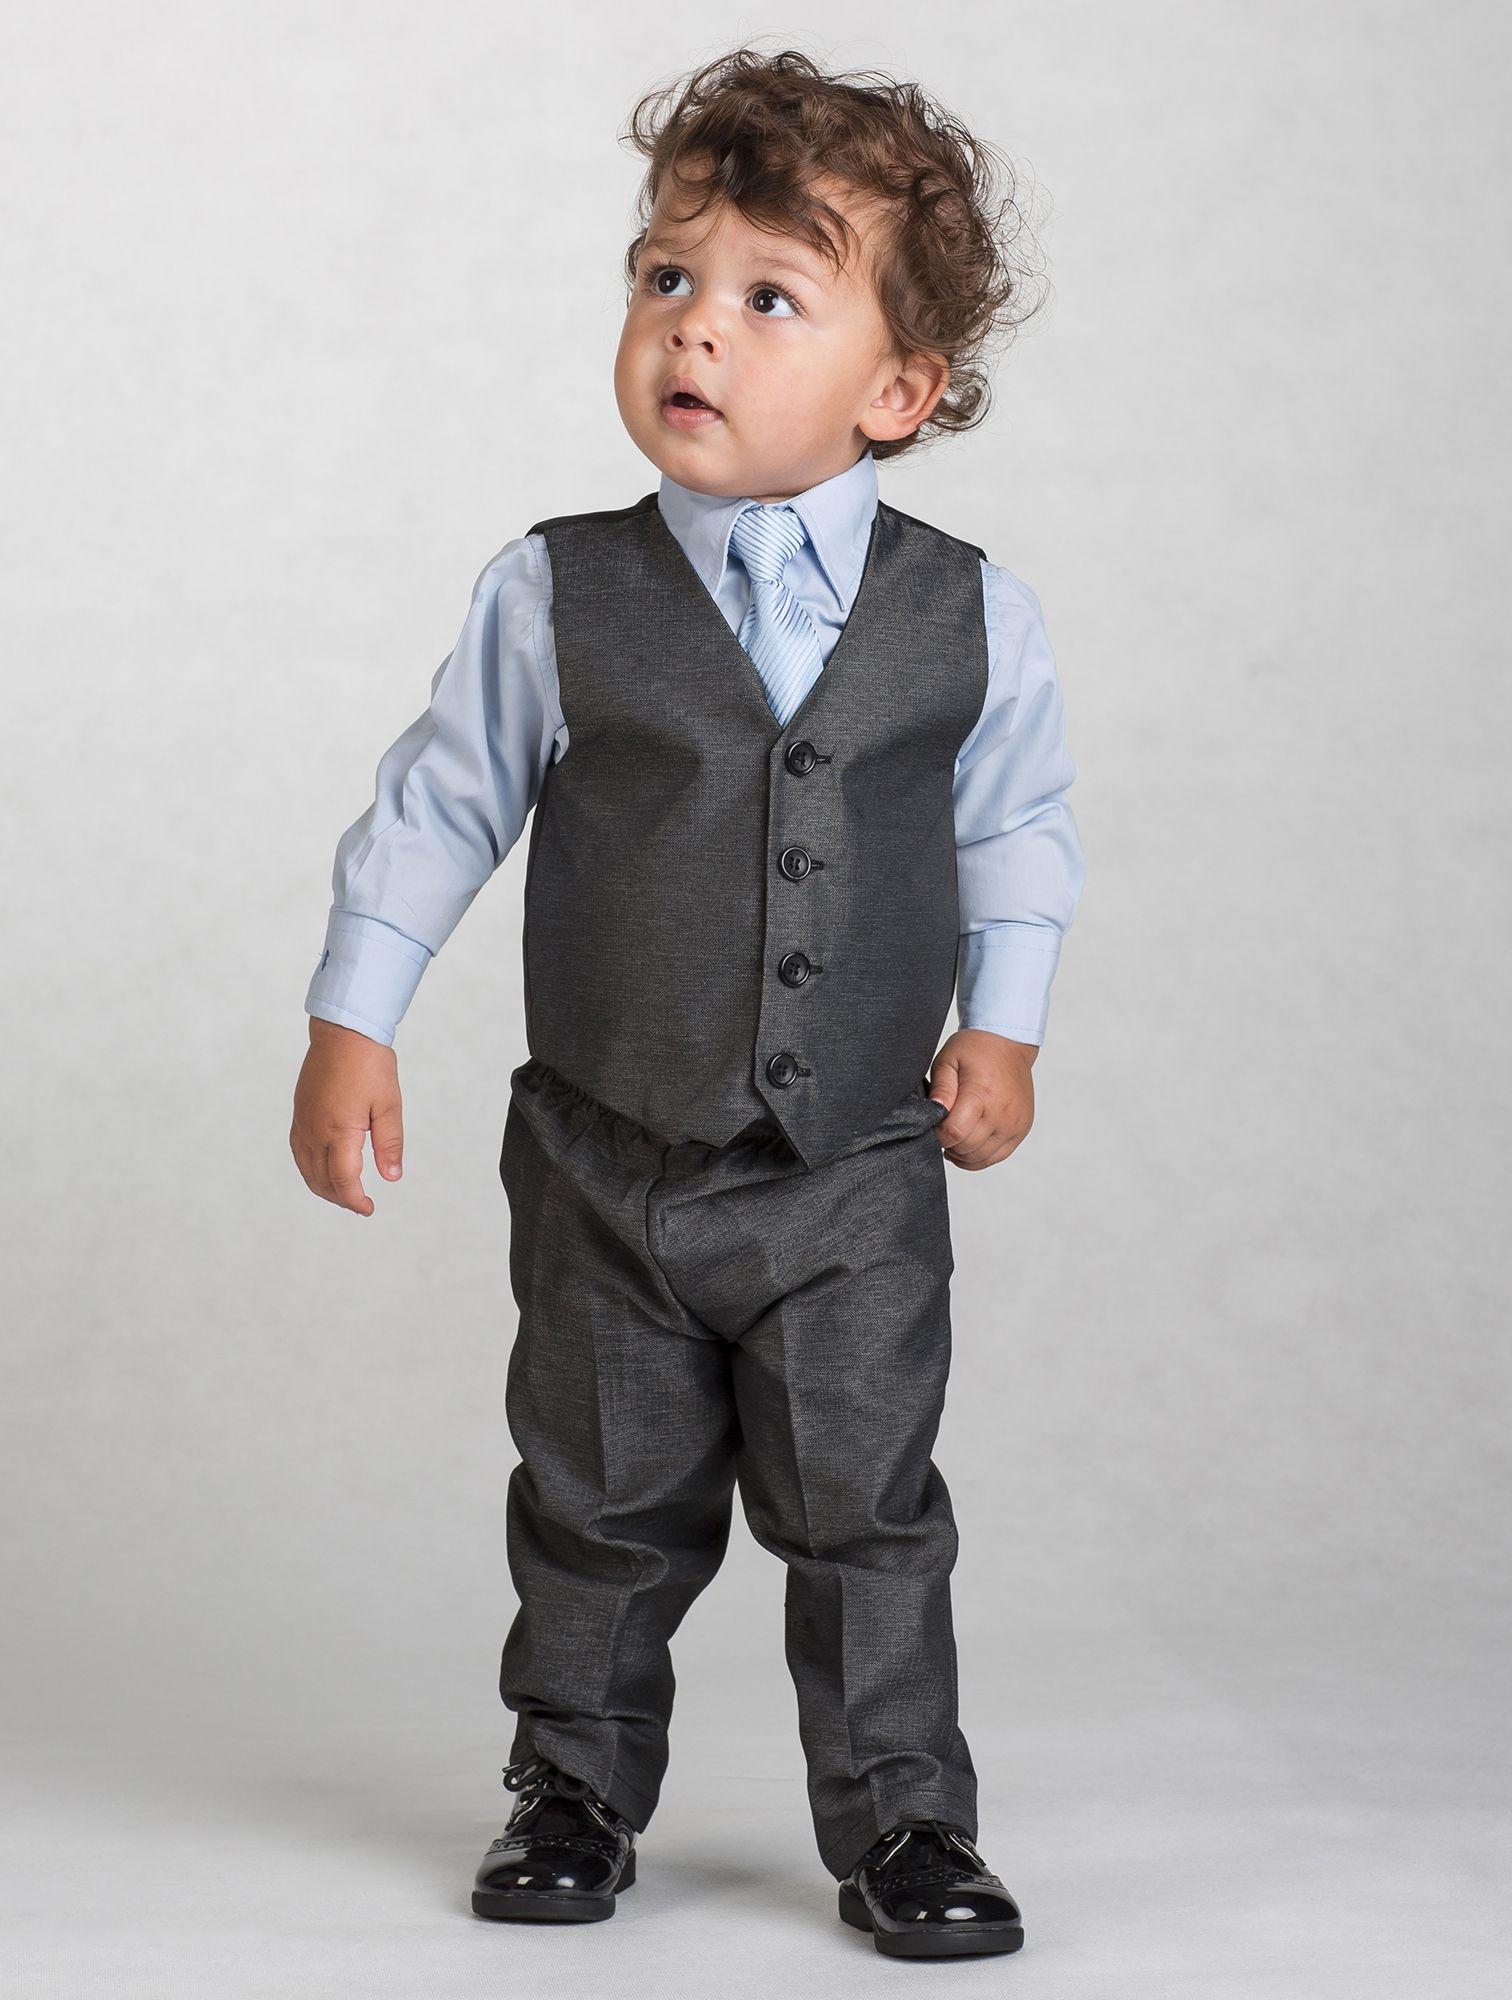 BOYS VEST WAISTCOAT WEDDING TUXEDO PAGEBOY COSTUME BLACK WHITE GREY BOW TIE SET